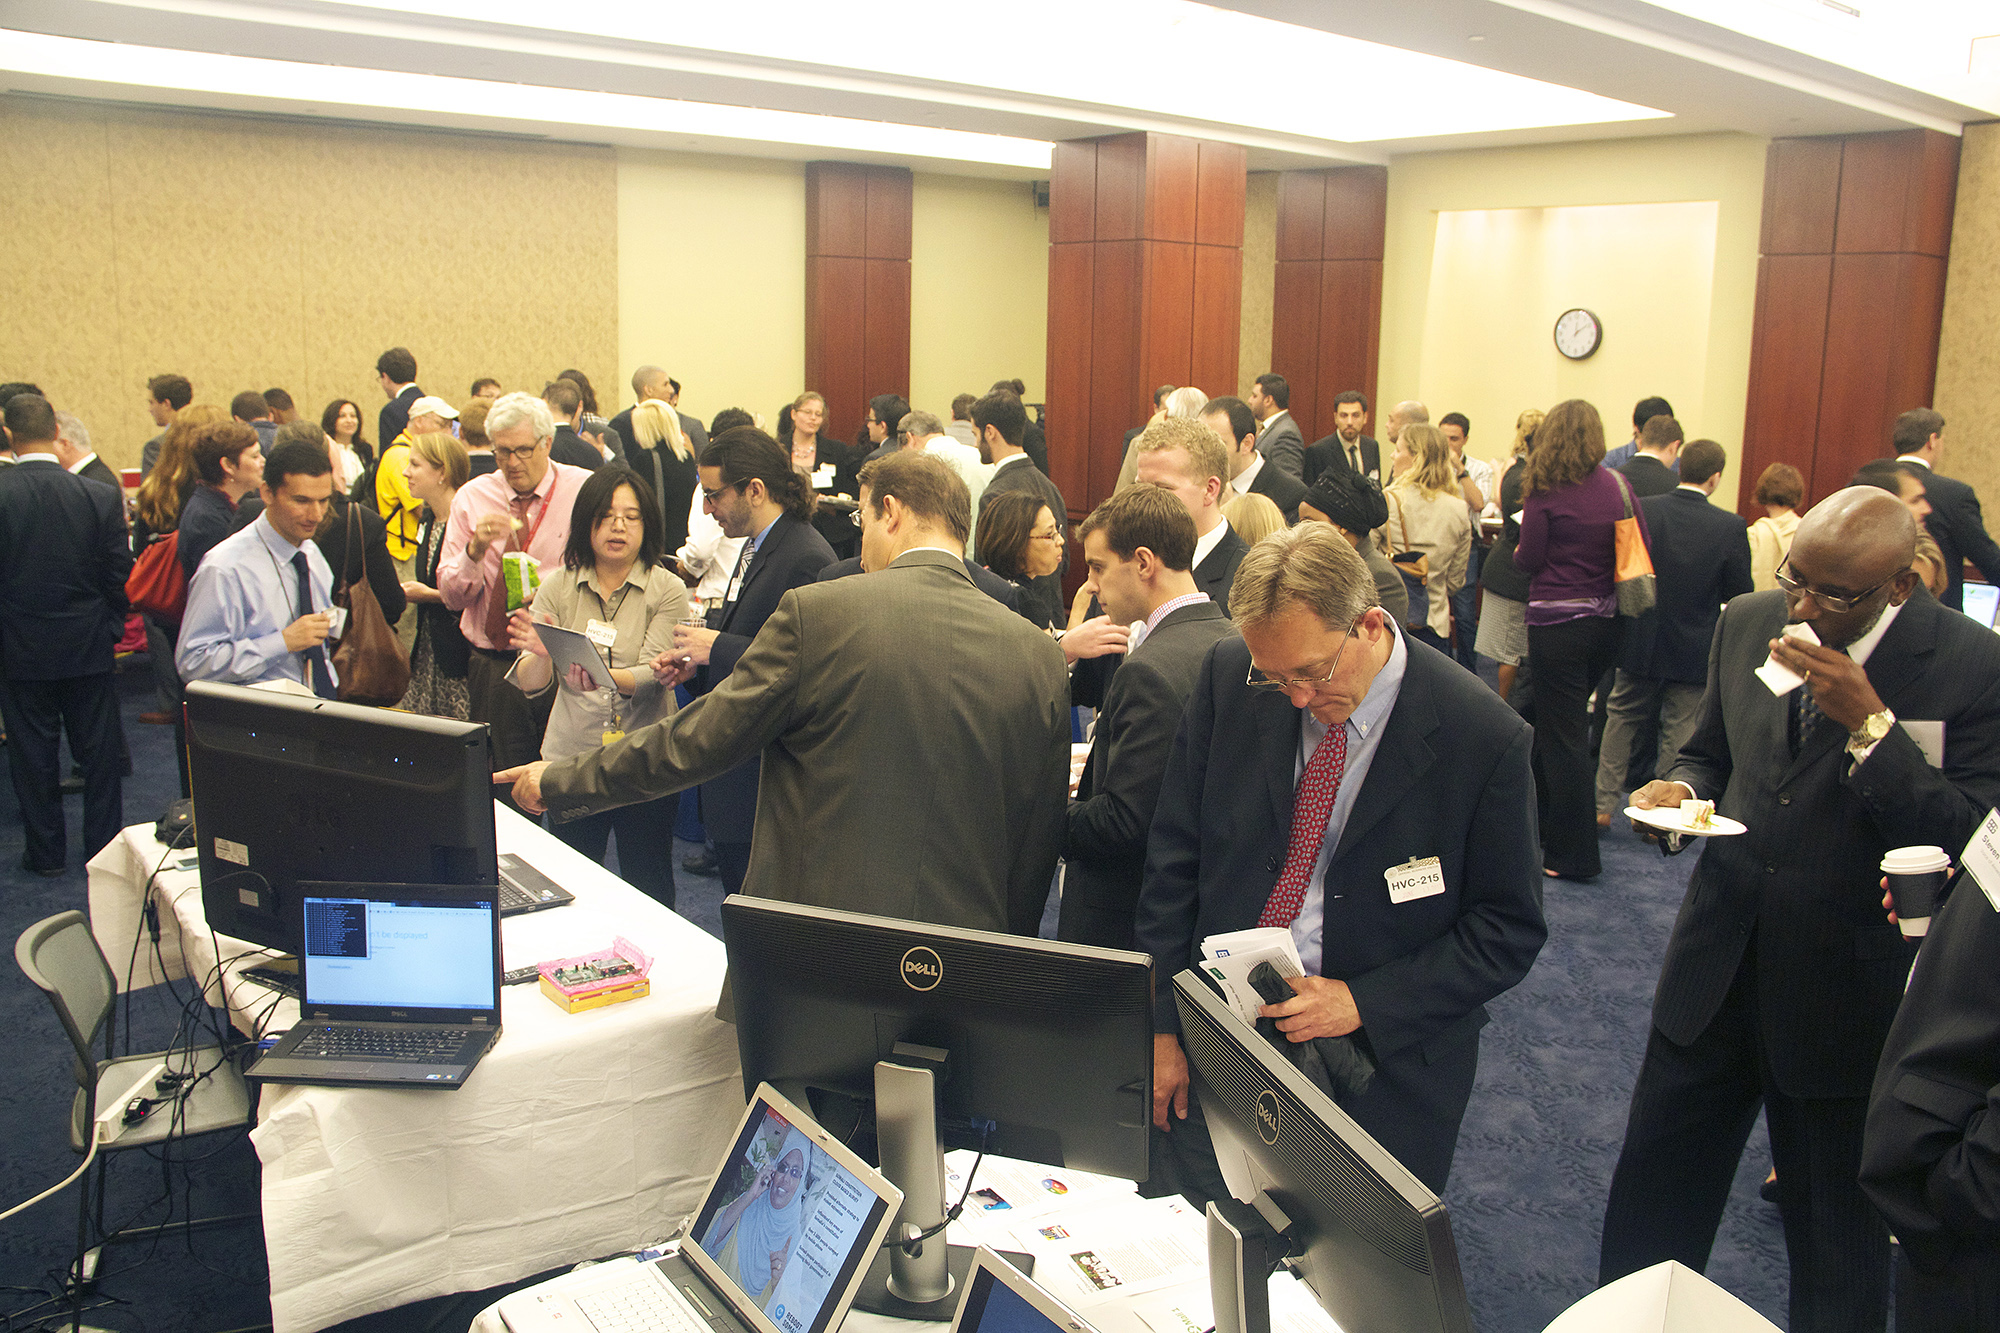 BBG Holds Digital Innovation Expo